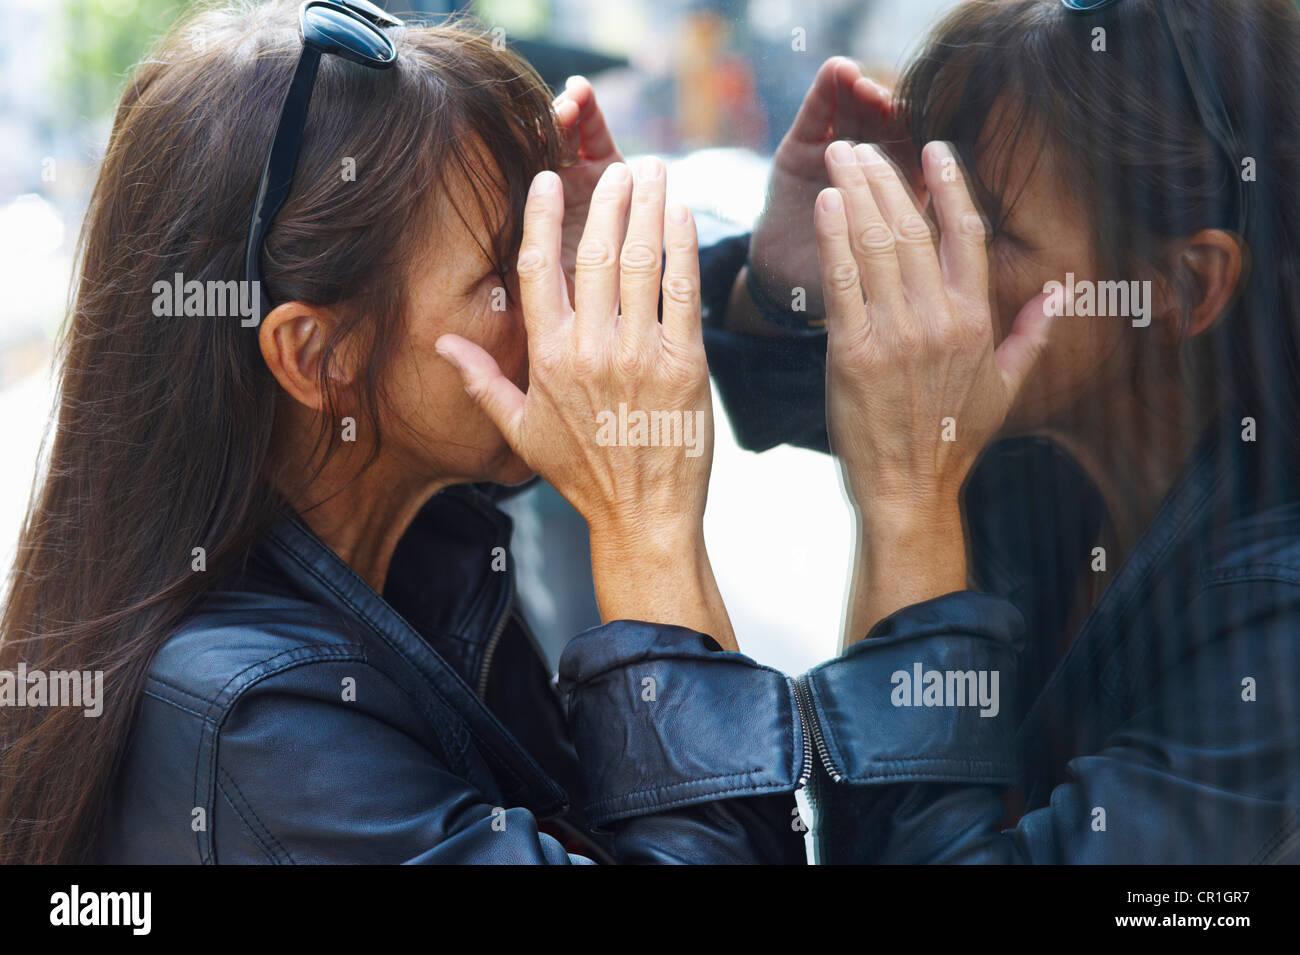 Woman peering through window - Stock Image